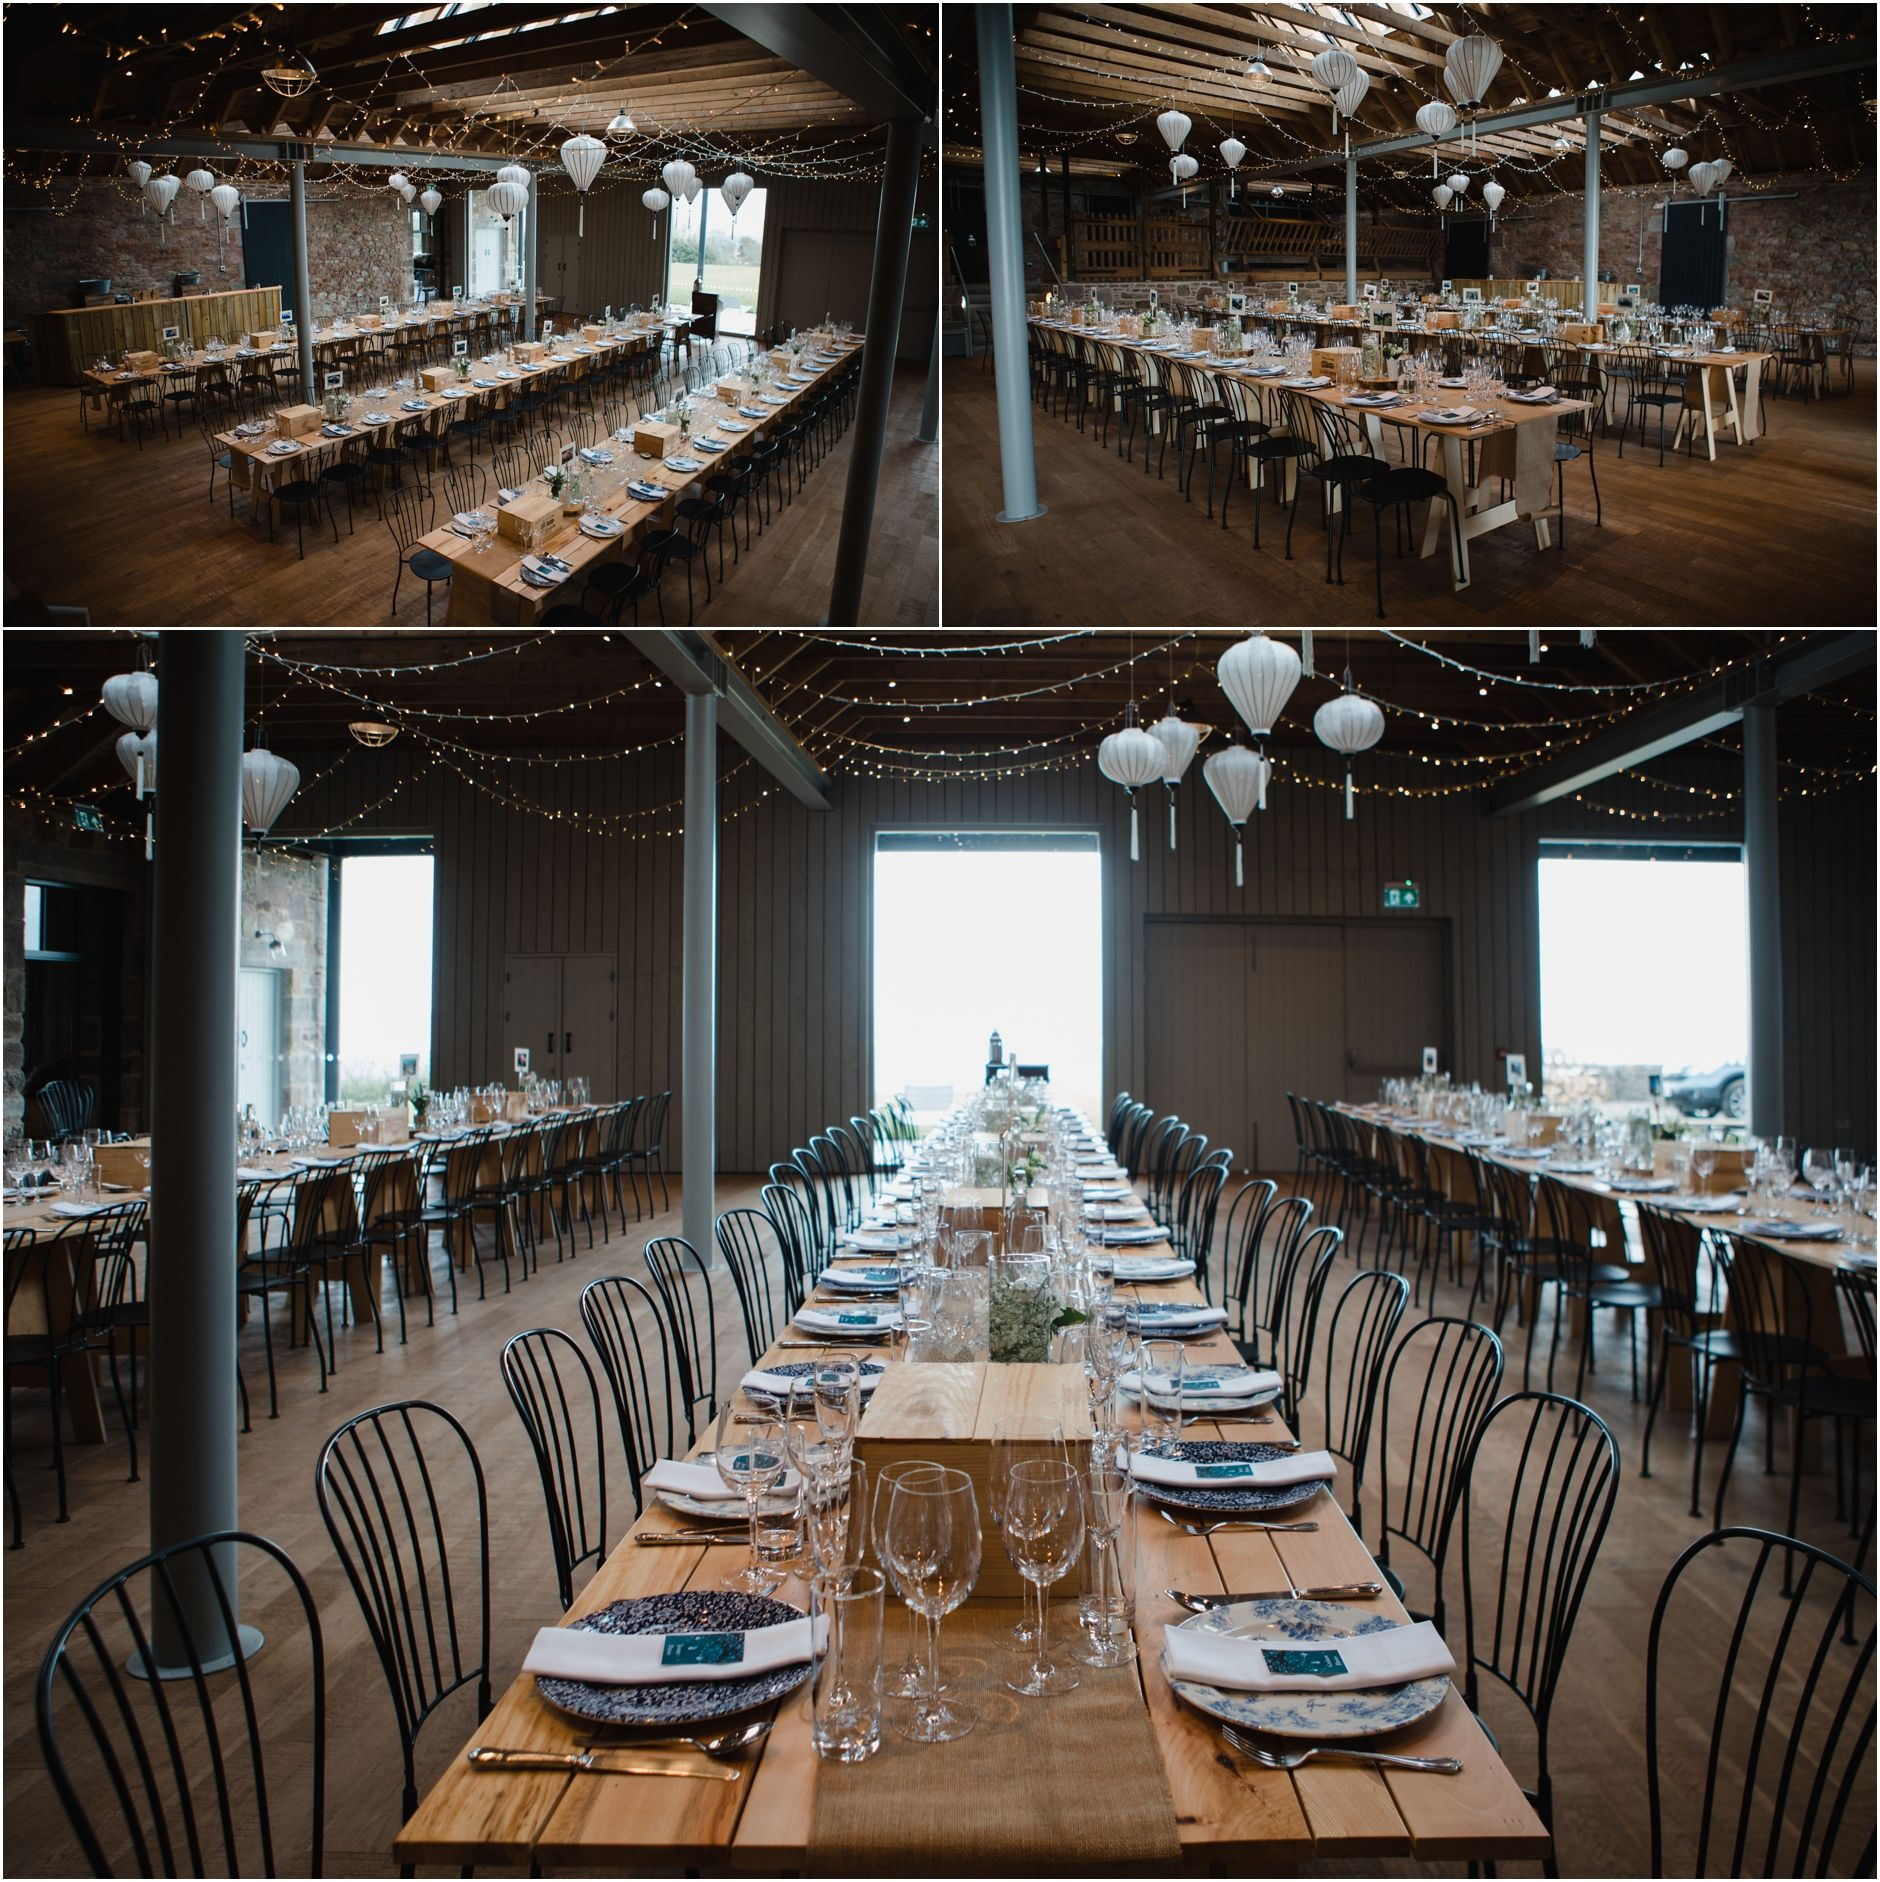 guardswell farm barn wedding scotland   Rustic barn ...